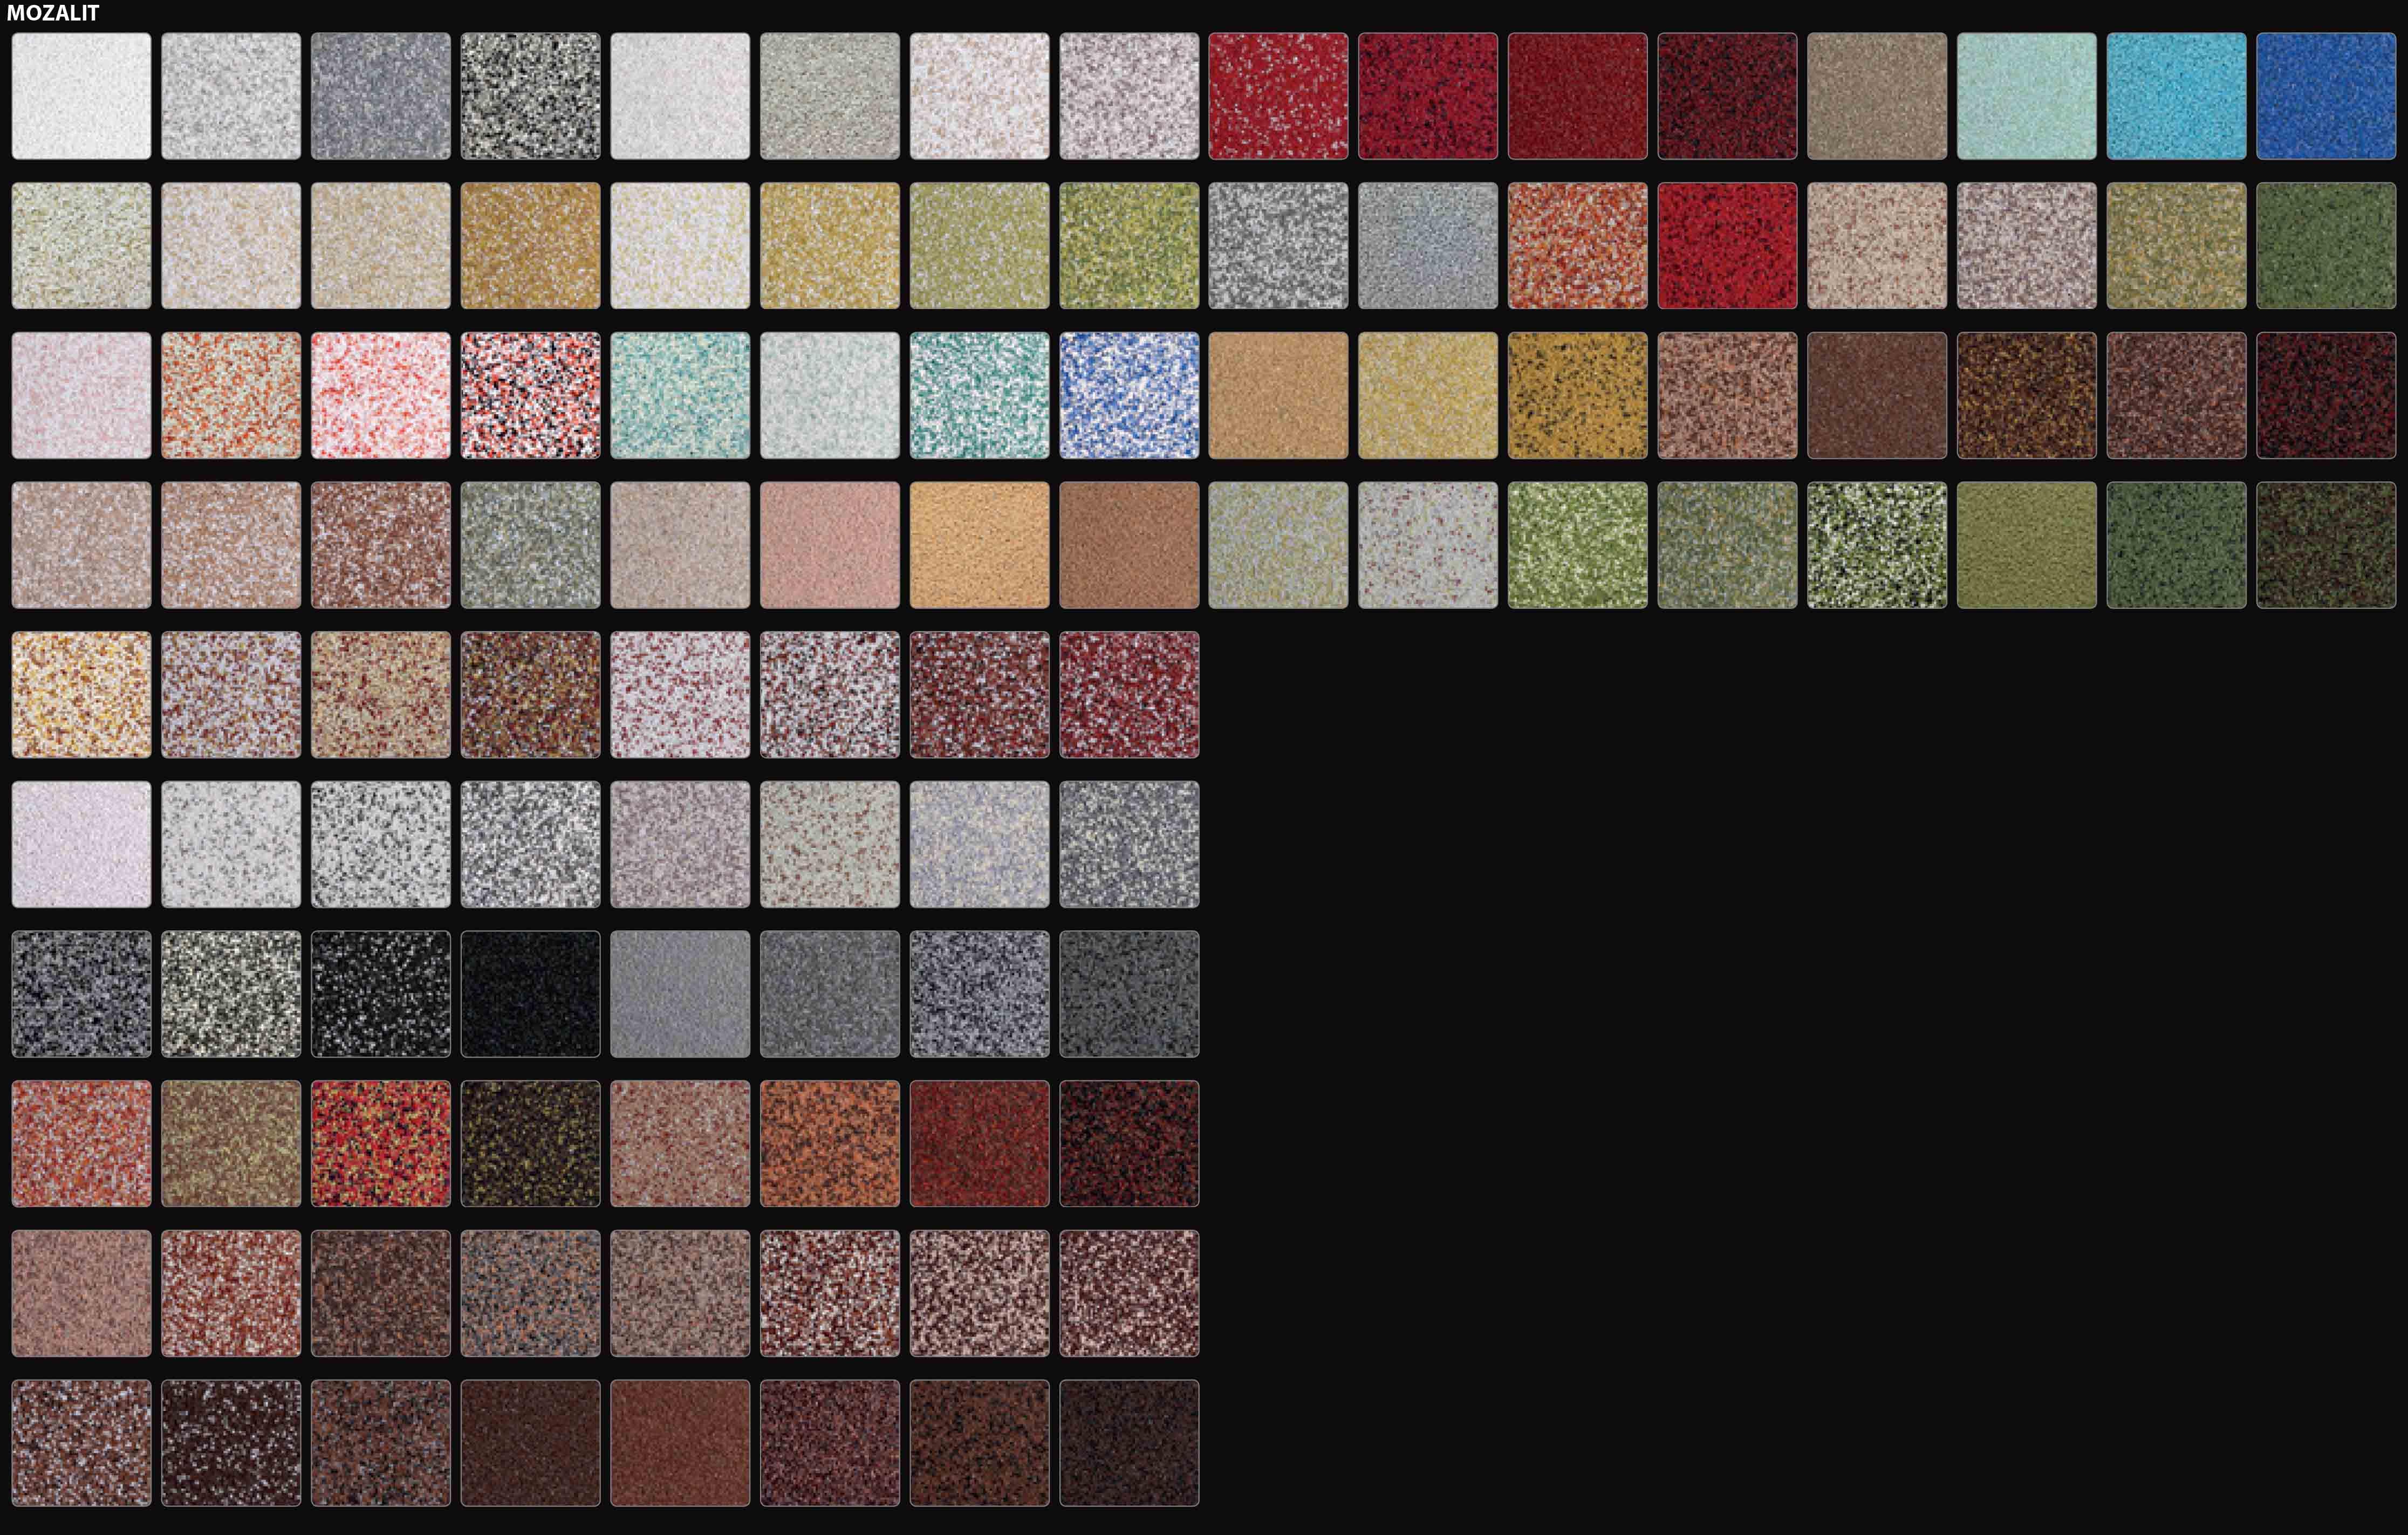 Цветовая палитра. Mozalit